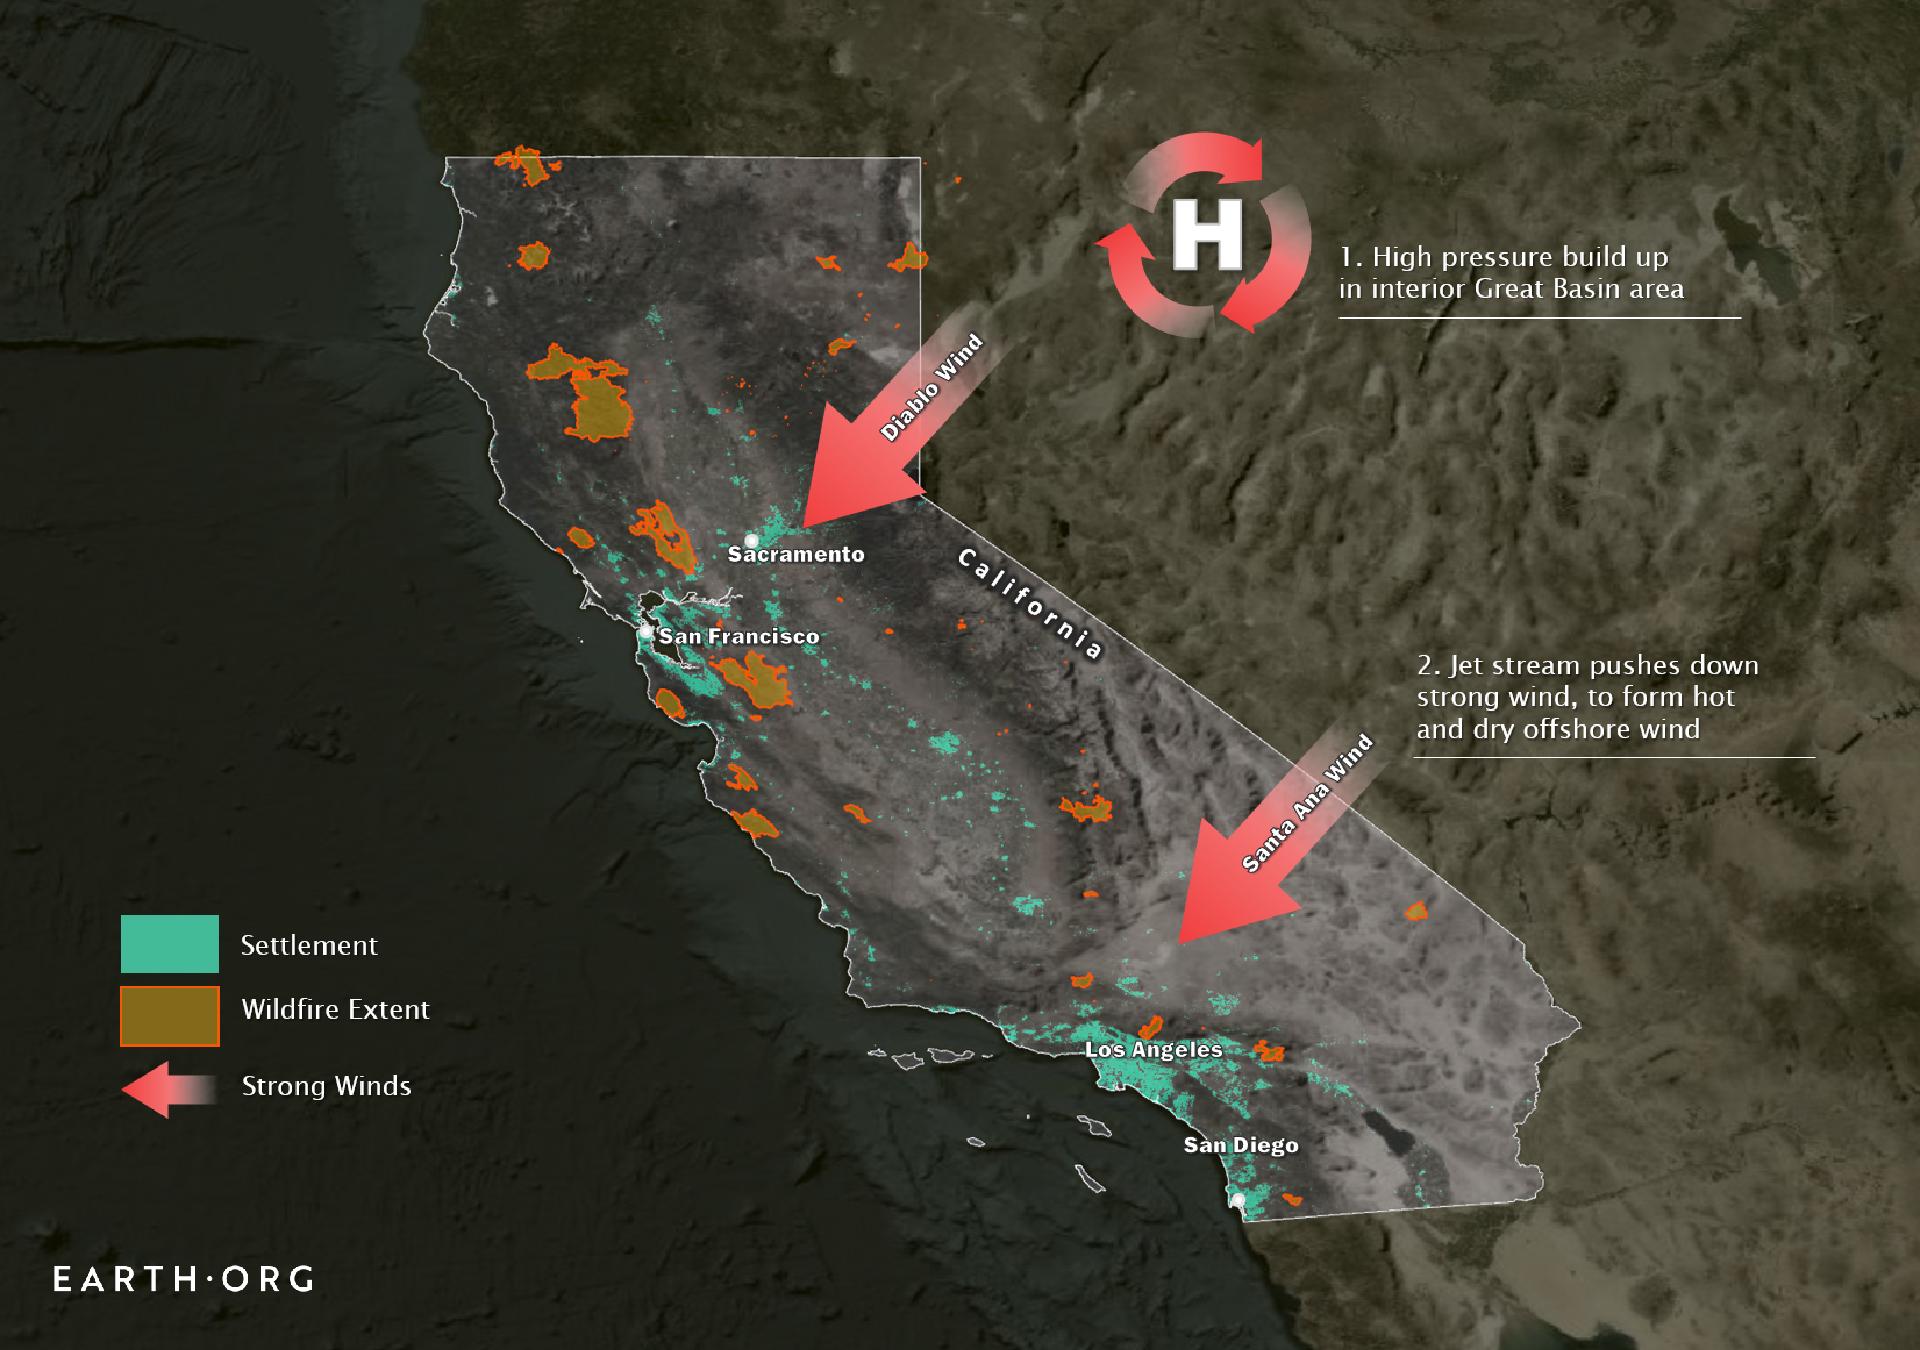 diablo santa ana winds california wildfires